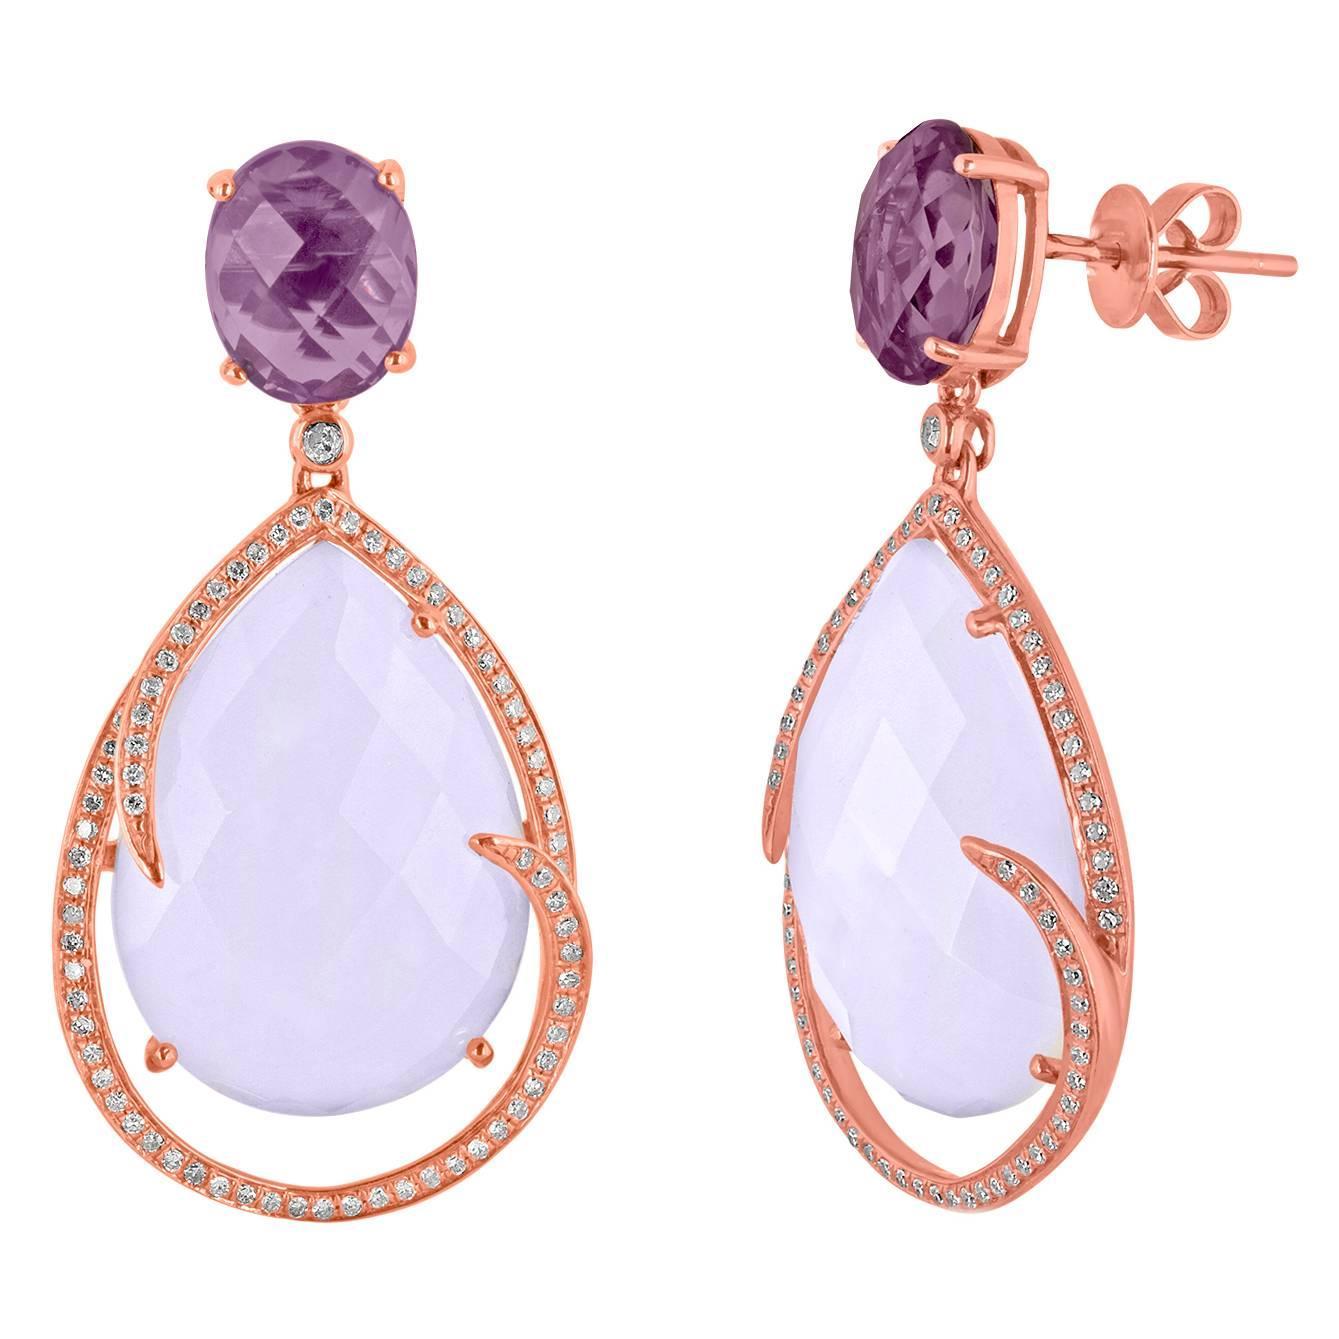 26.63 Carats Chalcedony and Amethyst Diamond Earrings